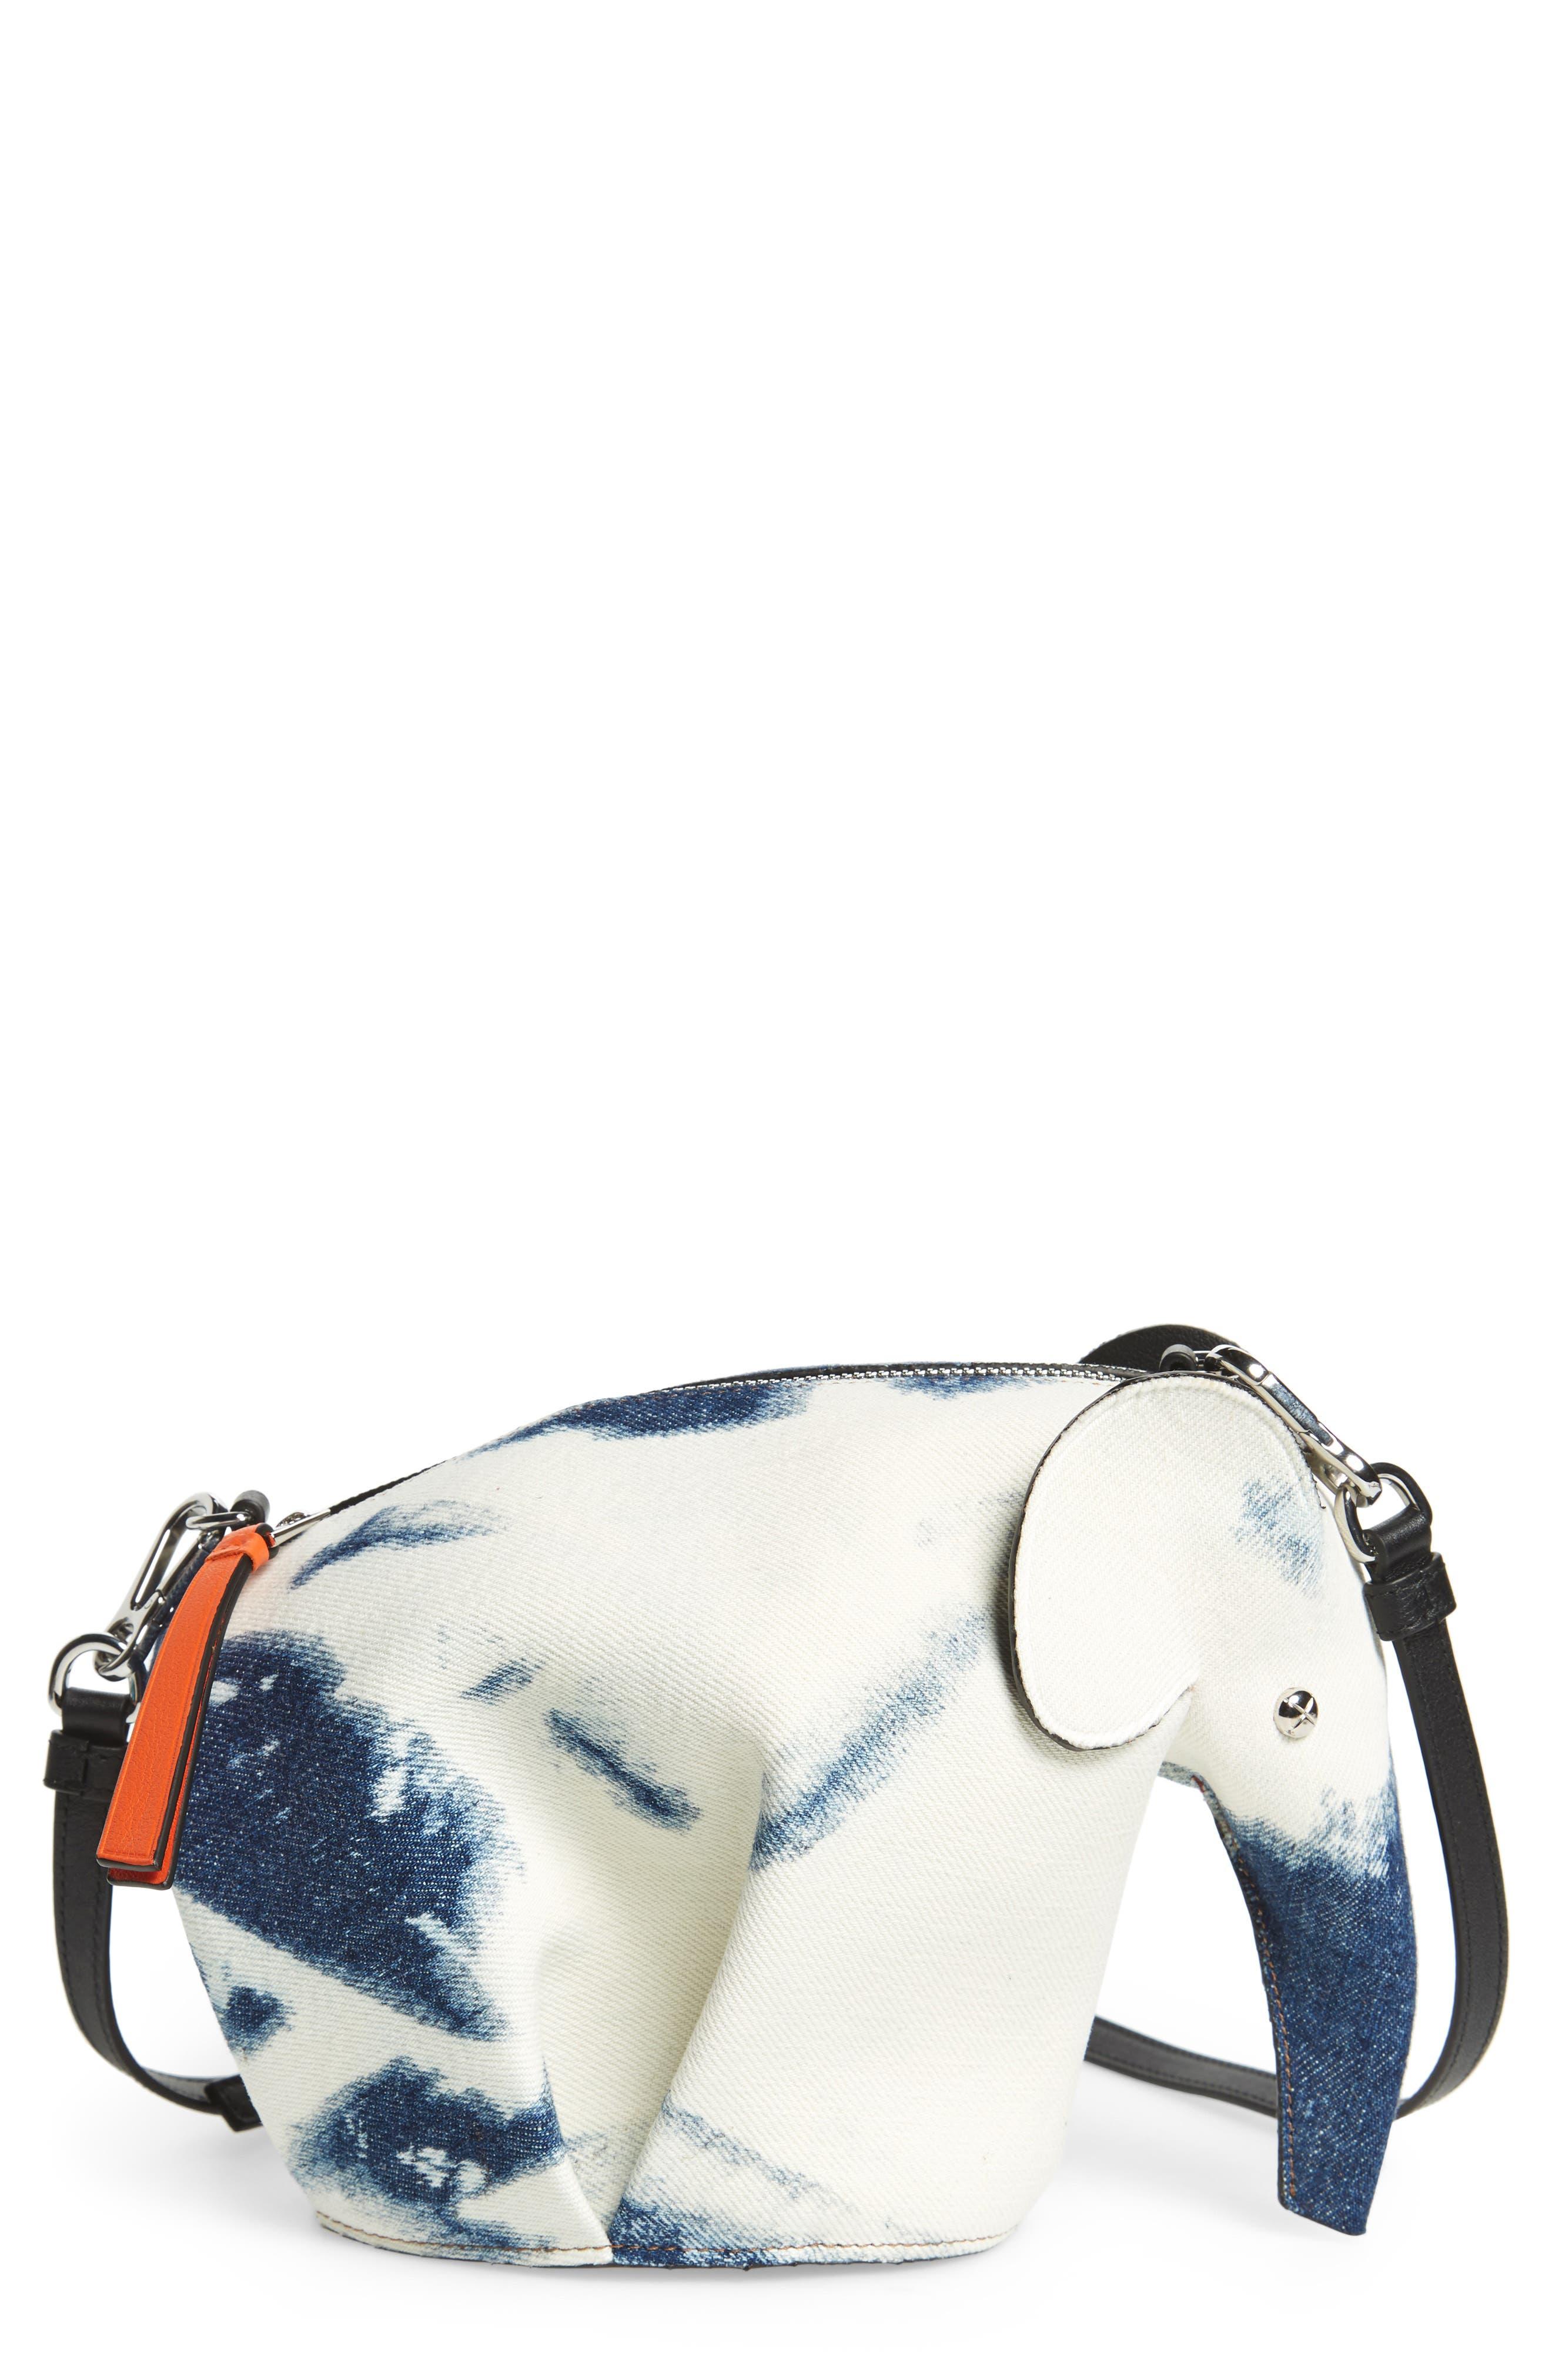 Denim Elephant Crossbody Bag,                             Main thumbnail 1, color,                             Blue Denim/ White/ Black